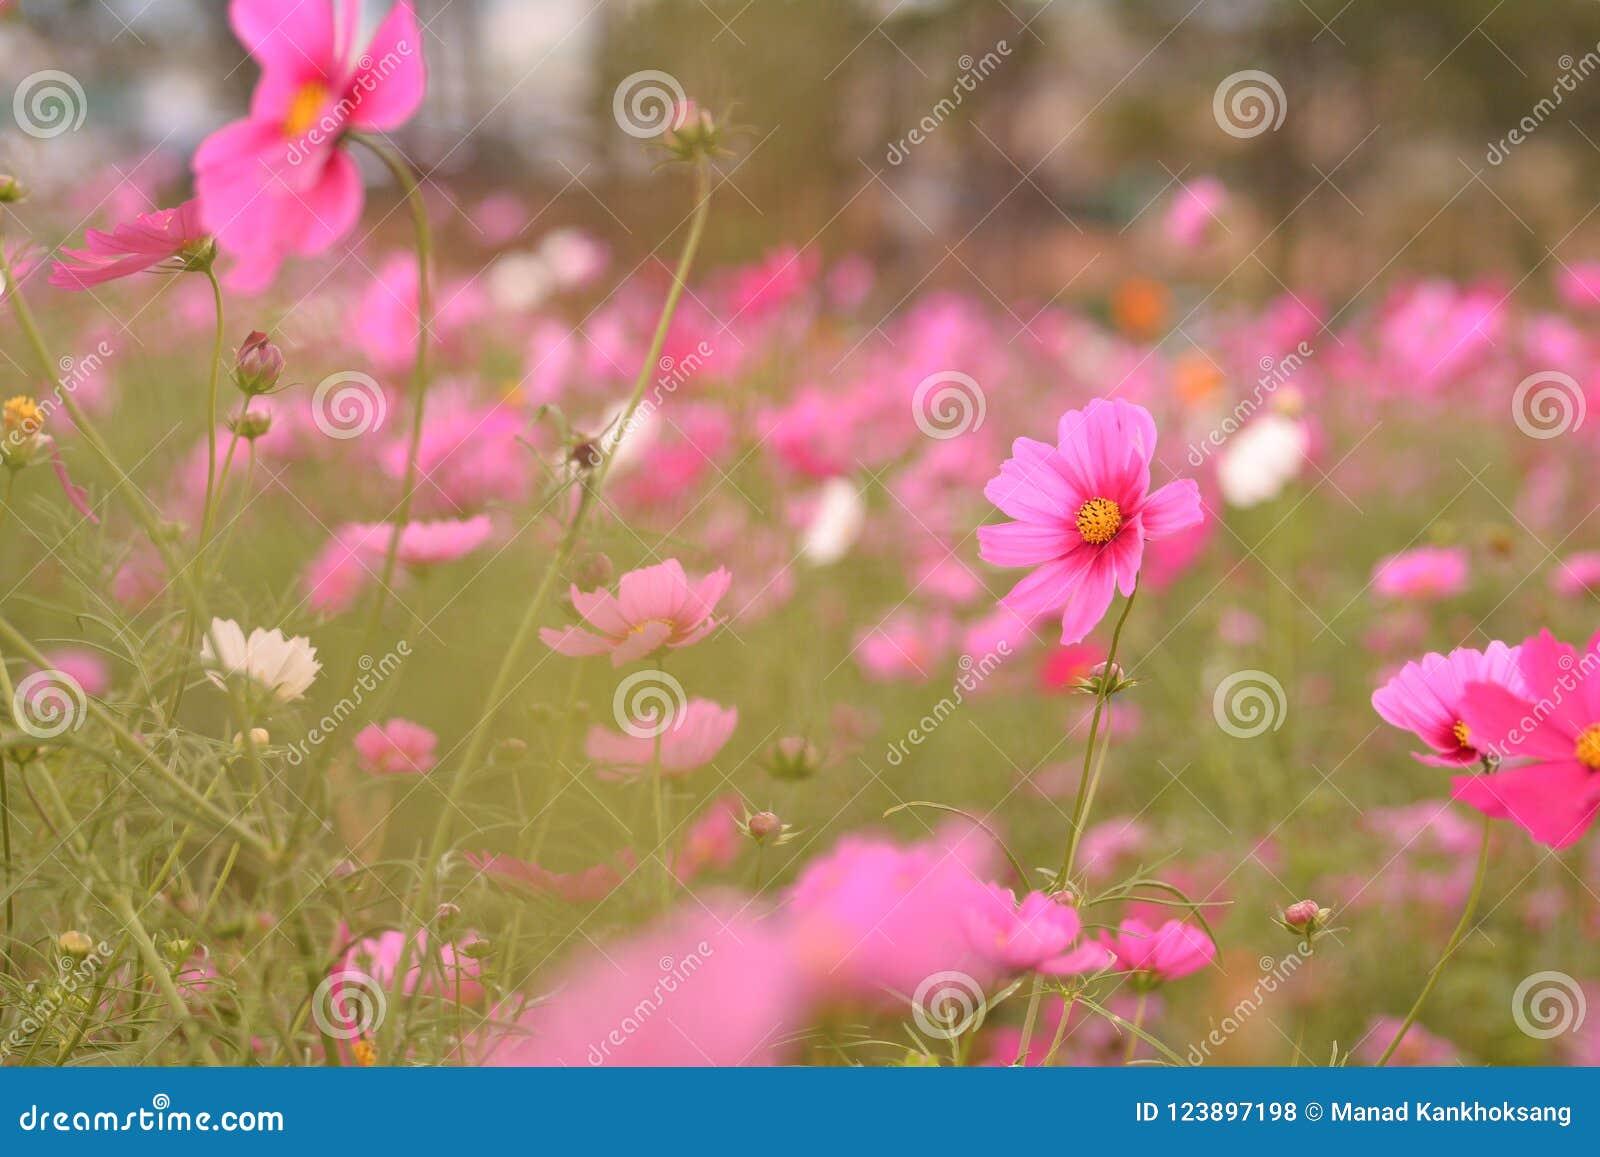 Pink Flowers Orange Yellow Stock Photo Image Of Beautiful 123897198